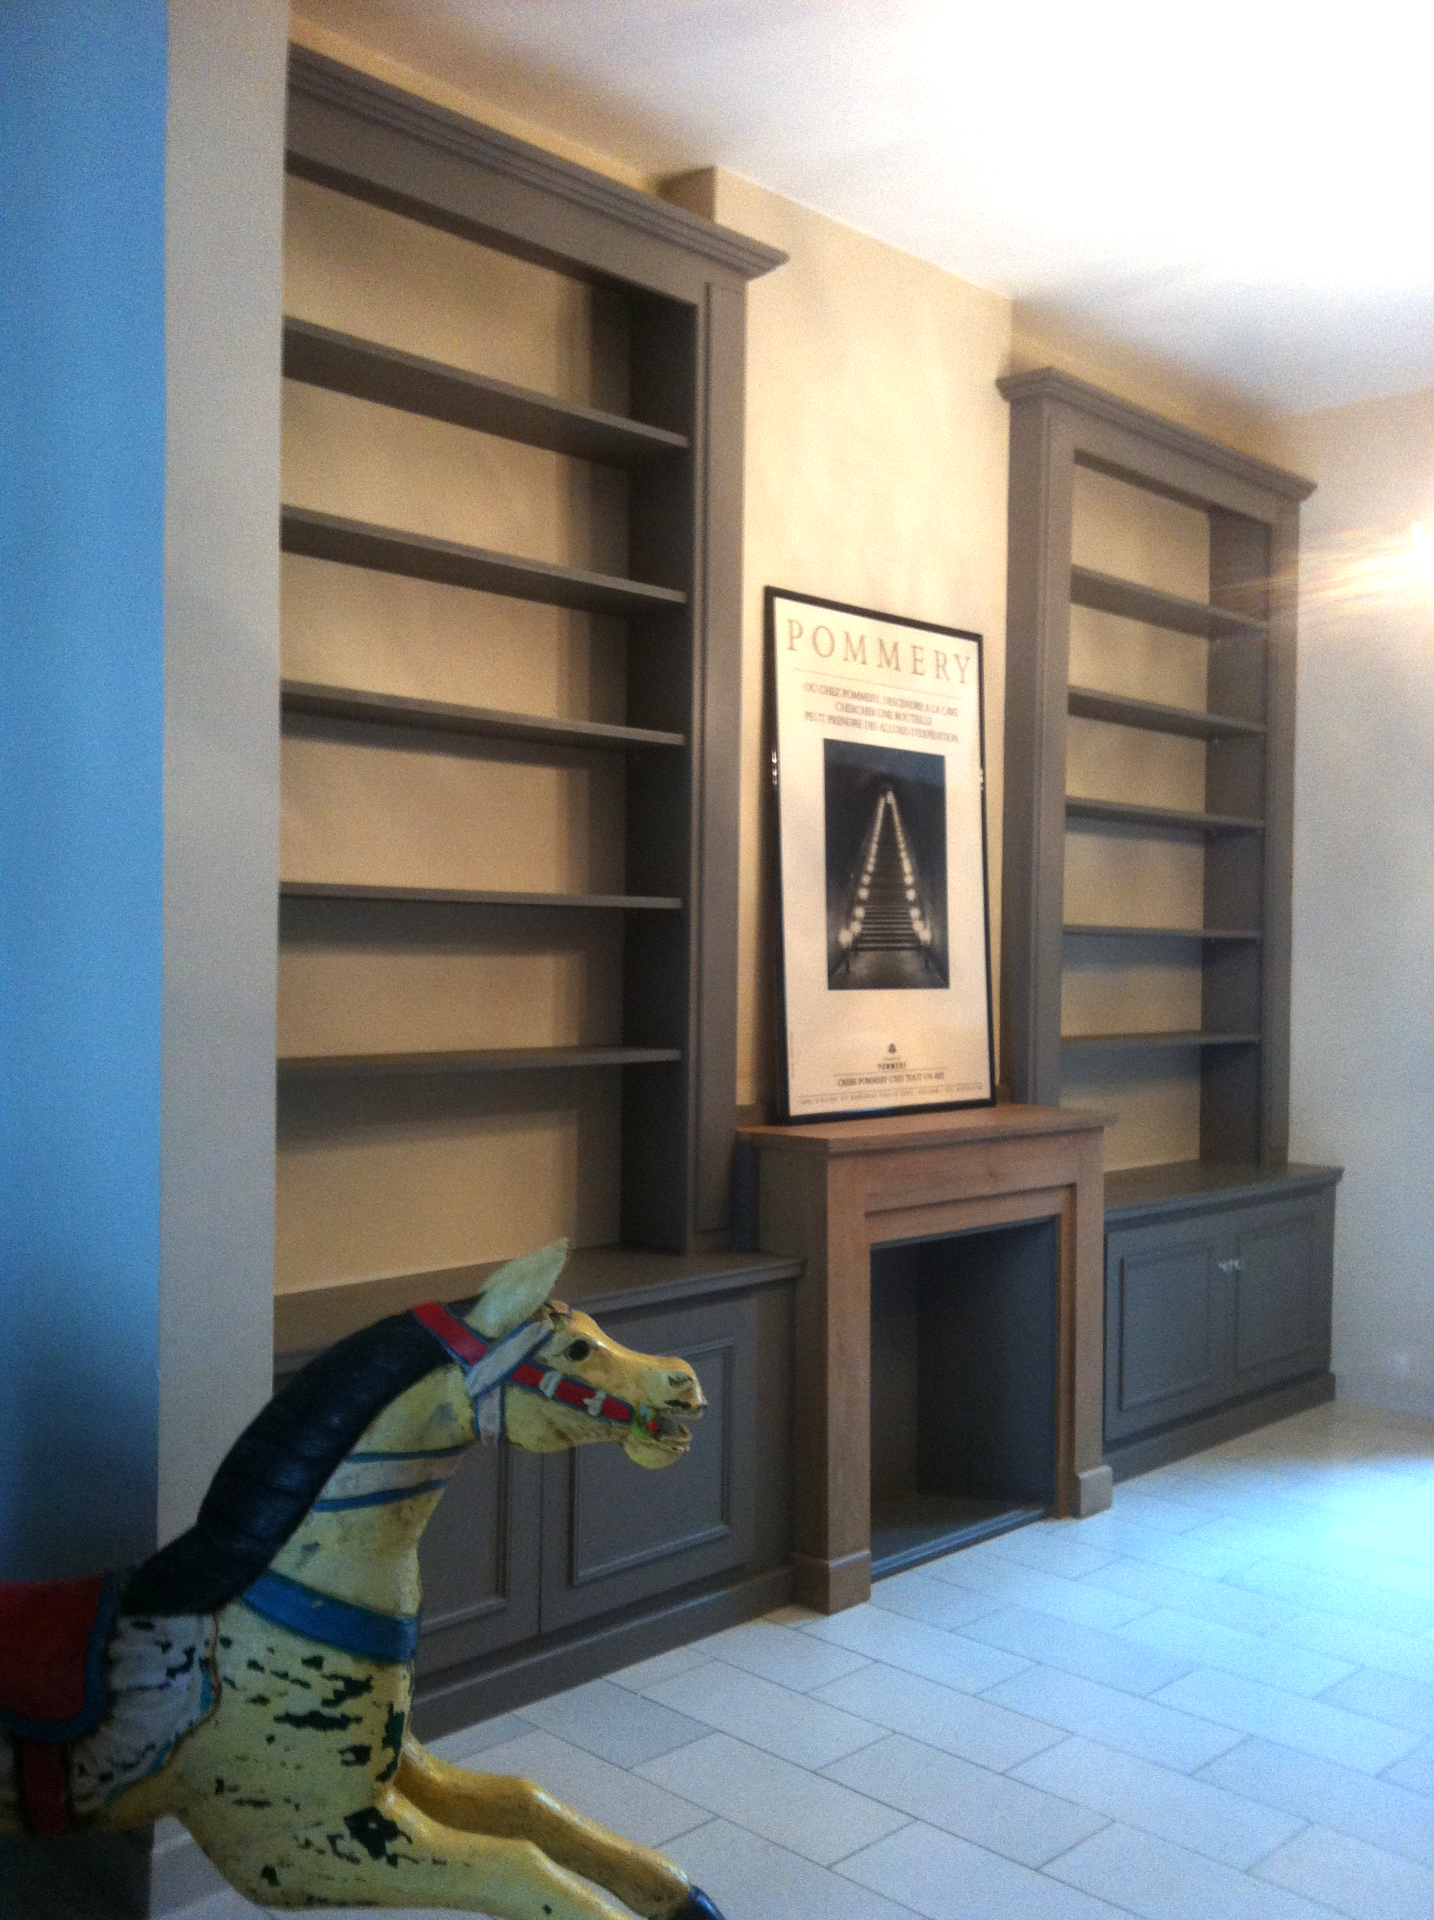 Lebeau Meuble Cheminee Bibliotheque Decoration Interieure Salon Moderne Deco Salon Cosy